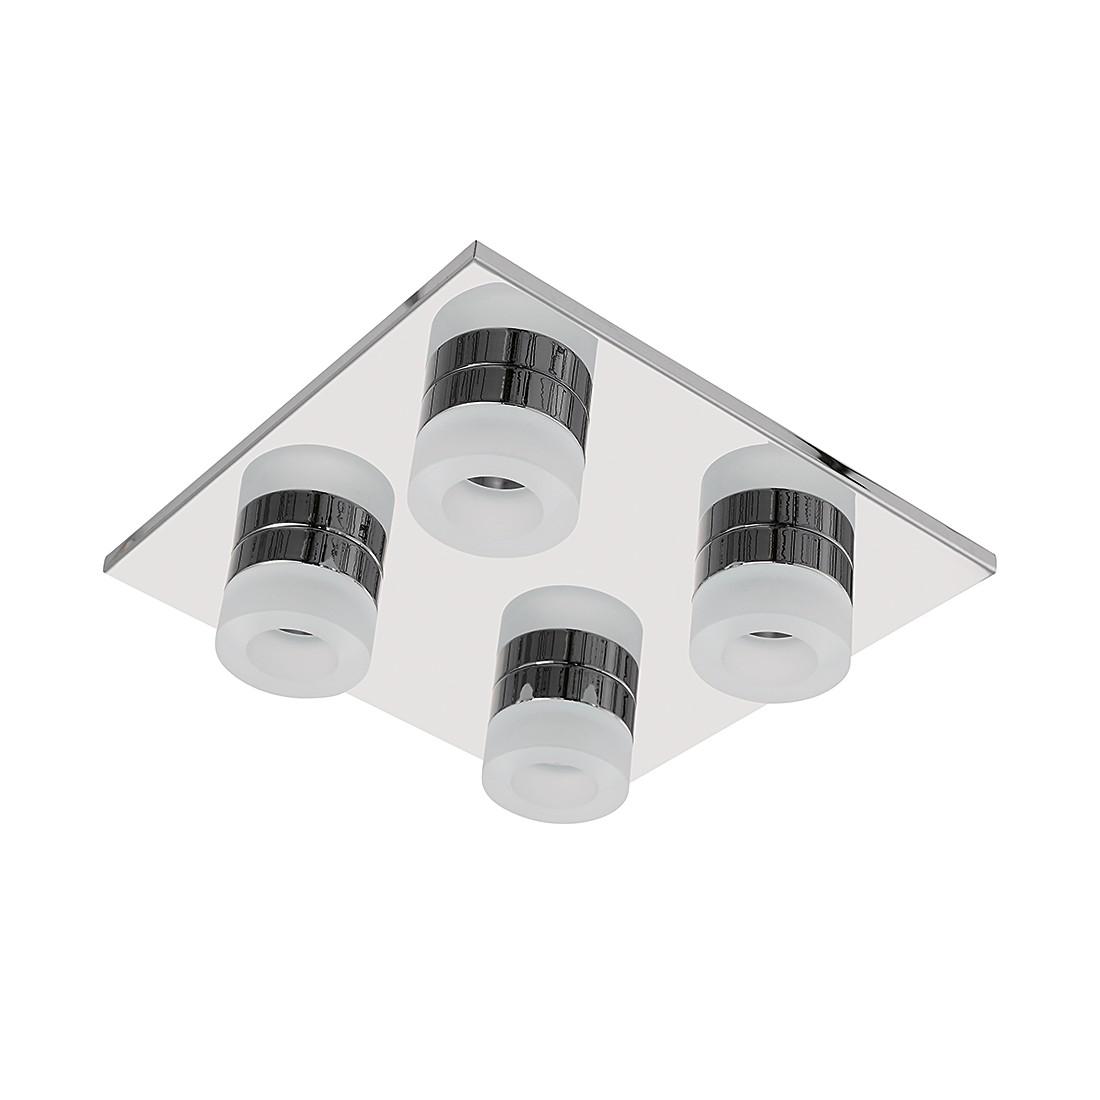 energie  A+, Plafondlamp LOGAN - metaal/kunststof - 4 lichtbronnen, Wofi